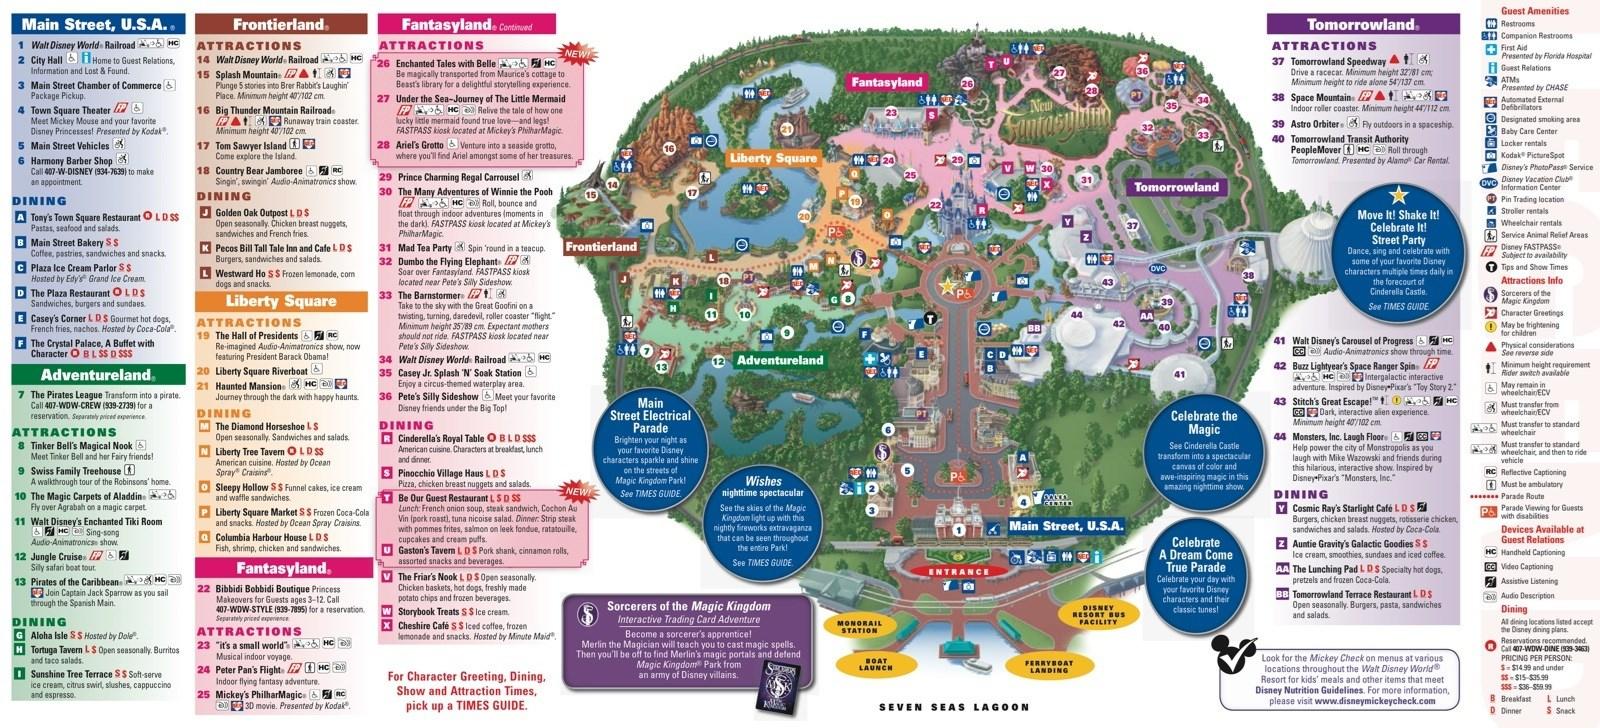 New Fantasyland on the Magic Kingdom guide map